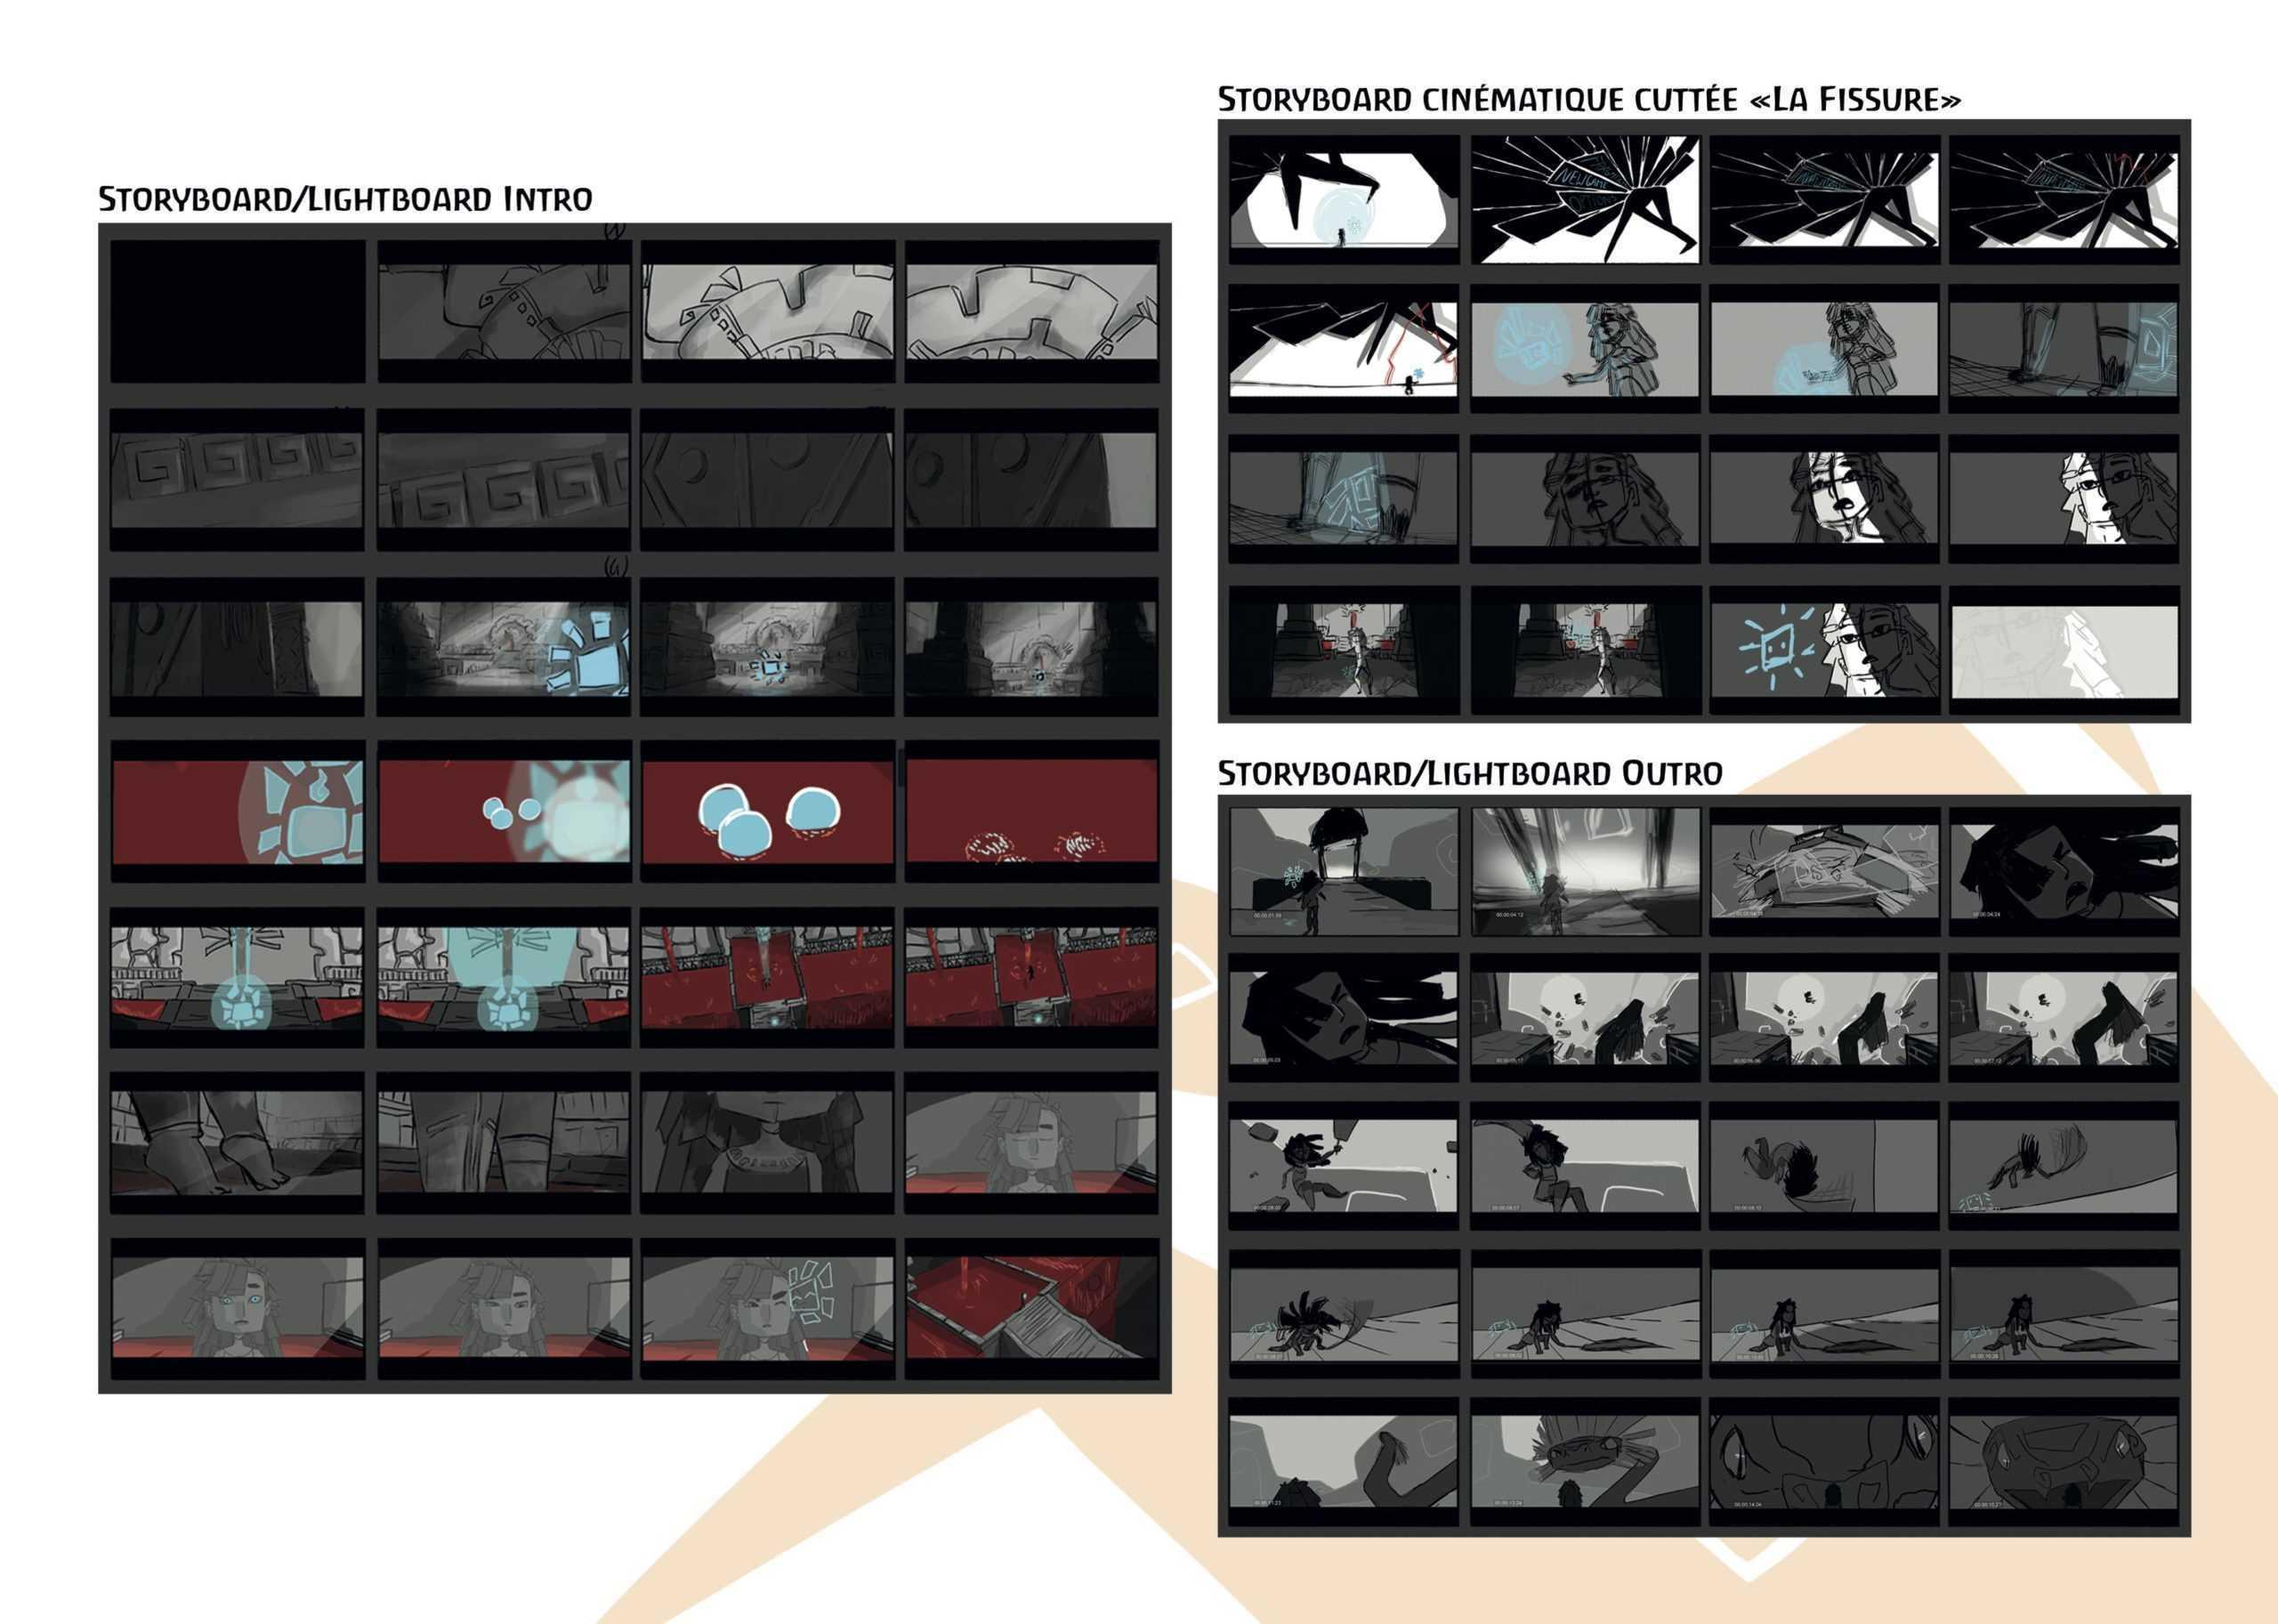 meika-artbook-lory-frachet-2-scaled.jpg